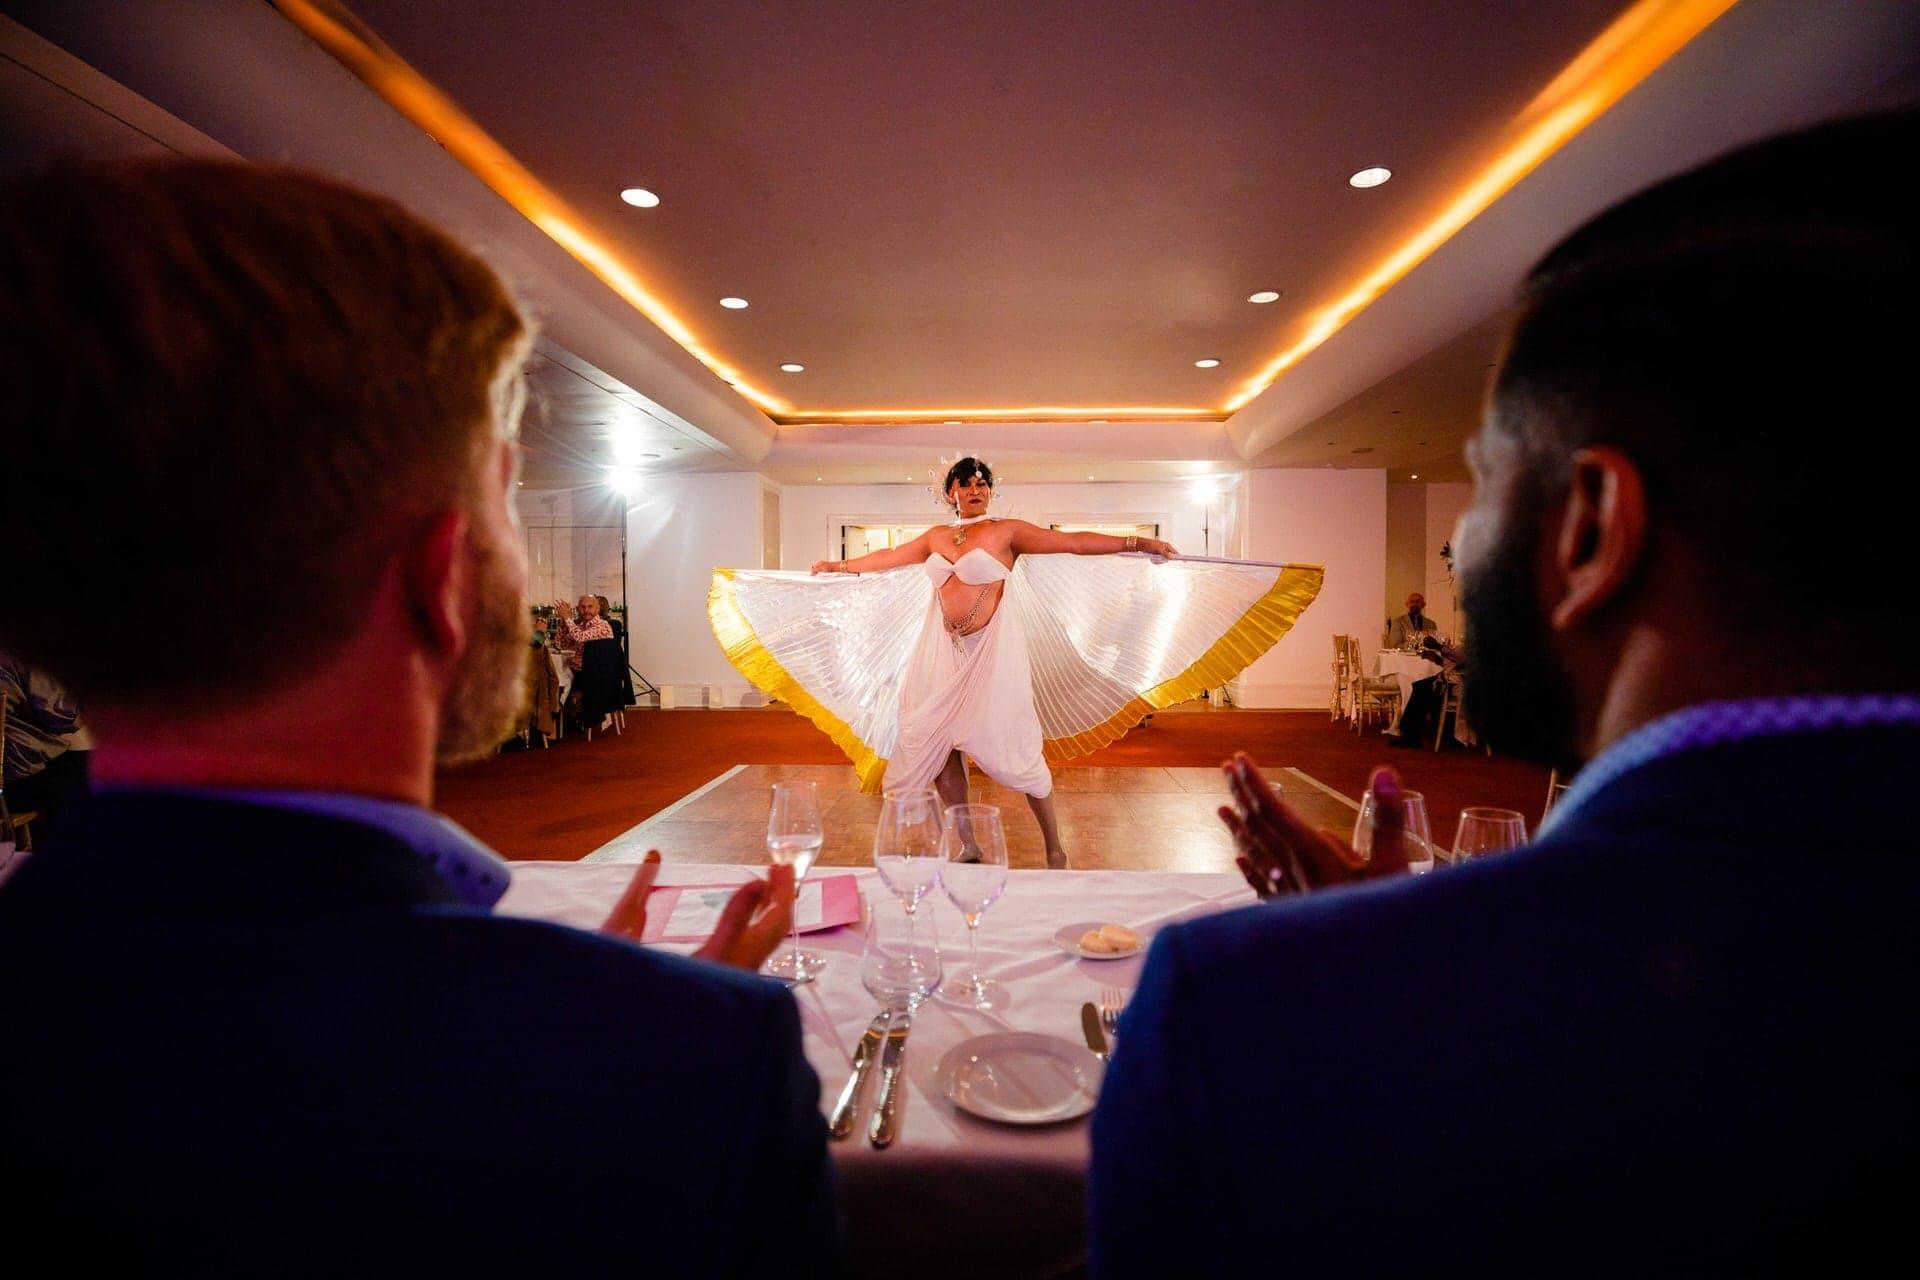 transvestite wedding entertainment